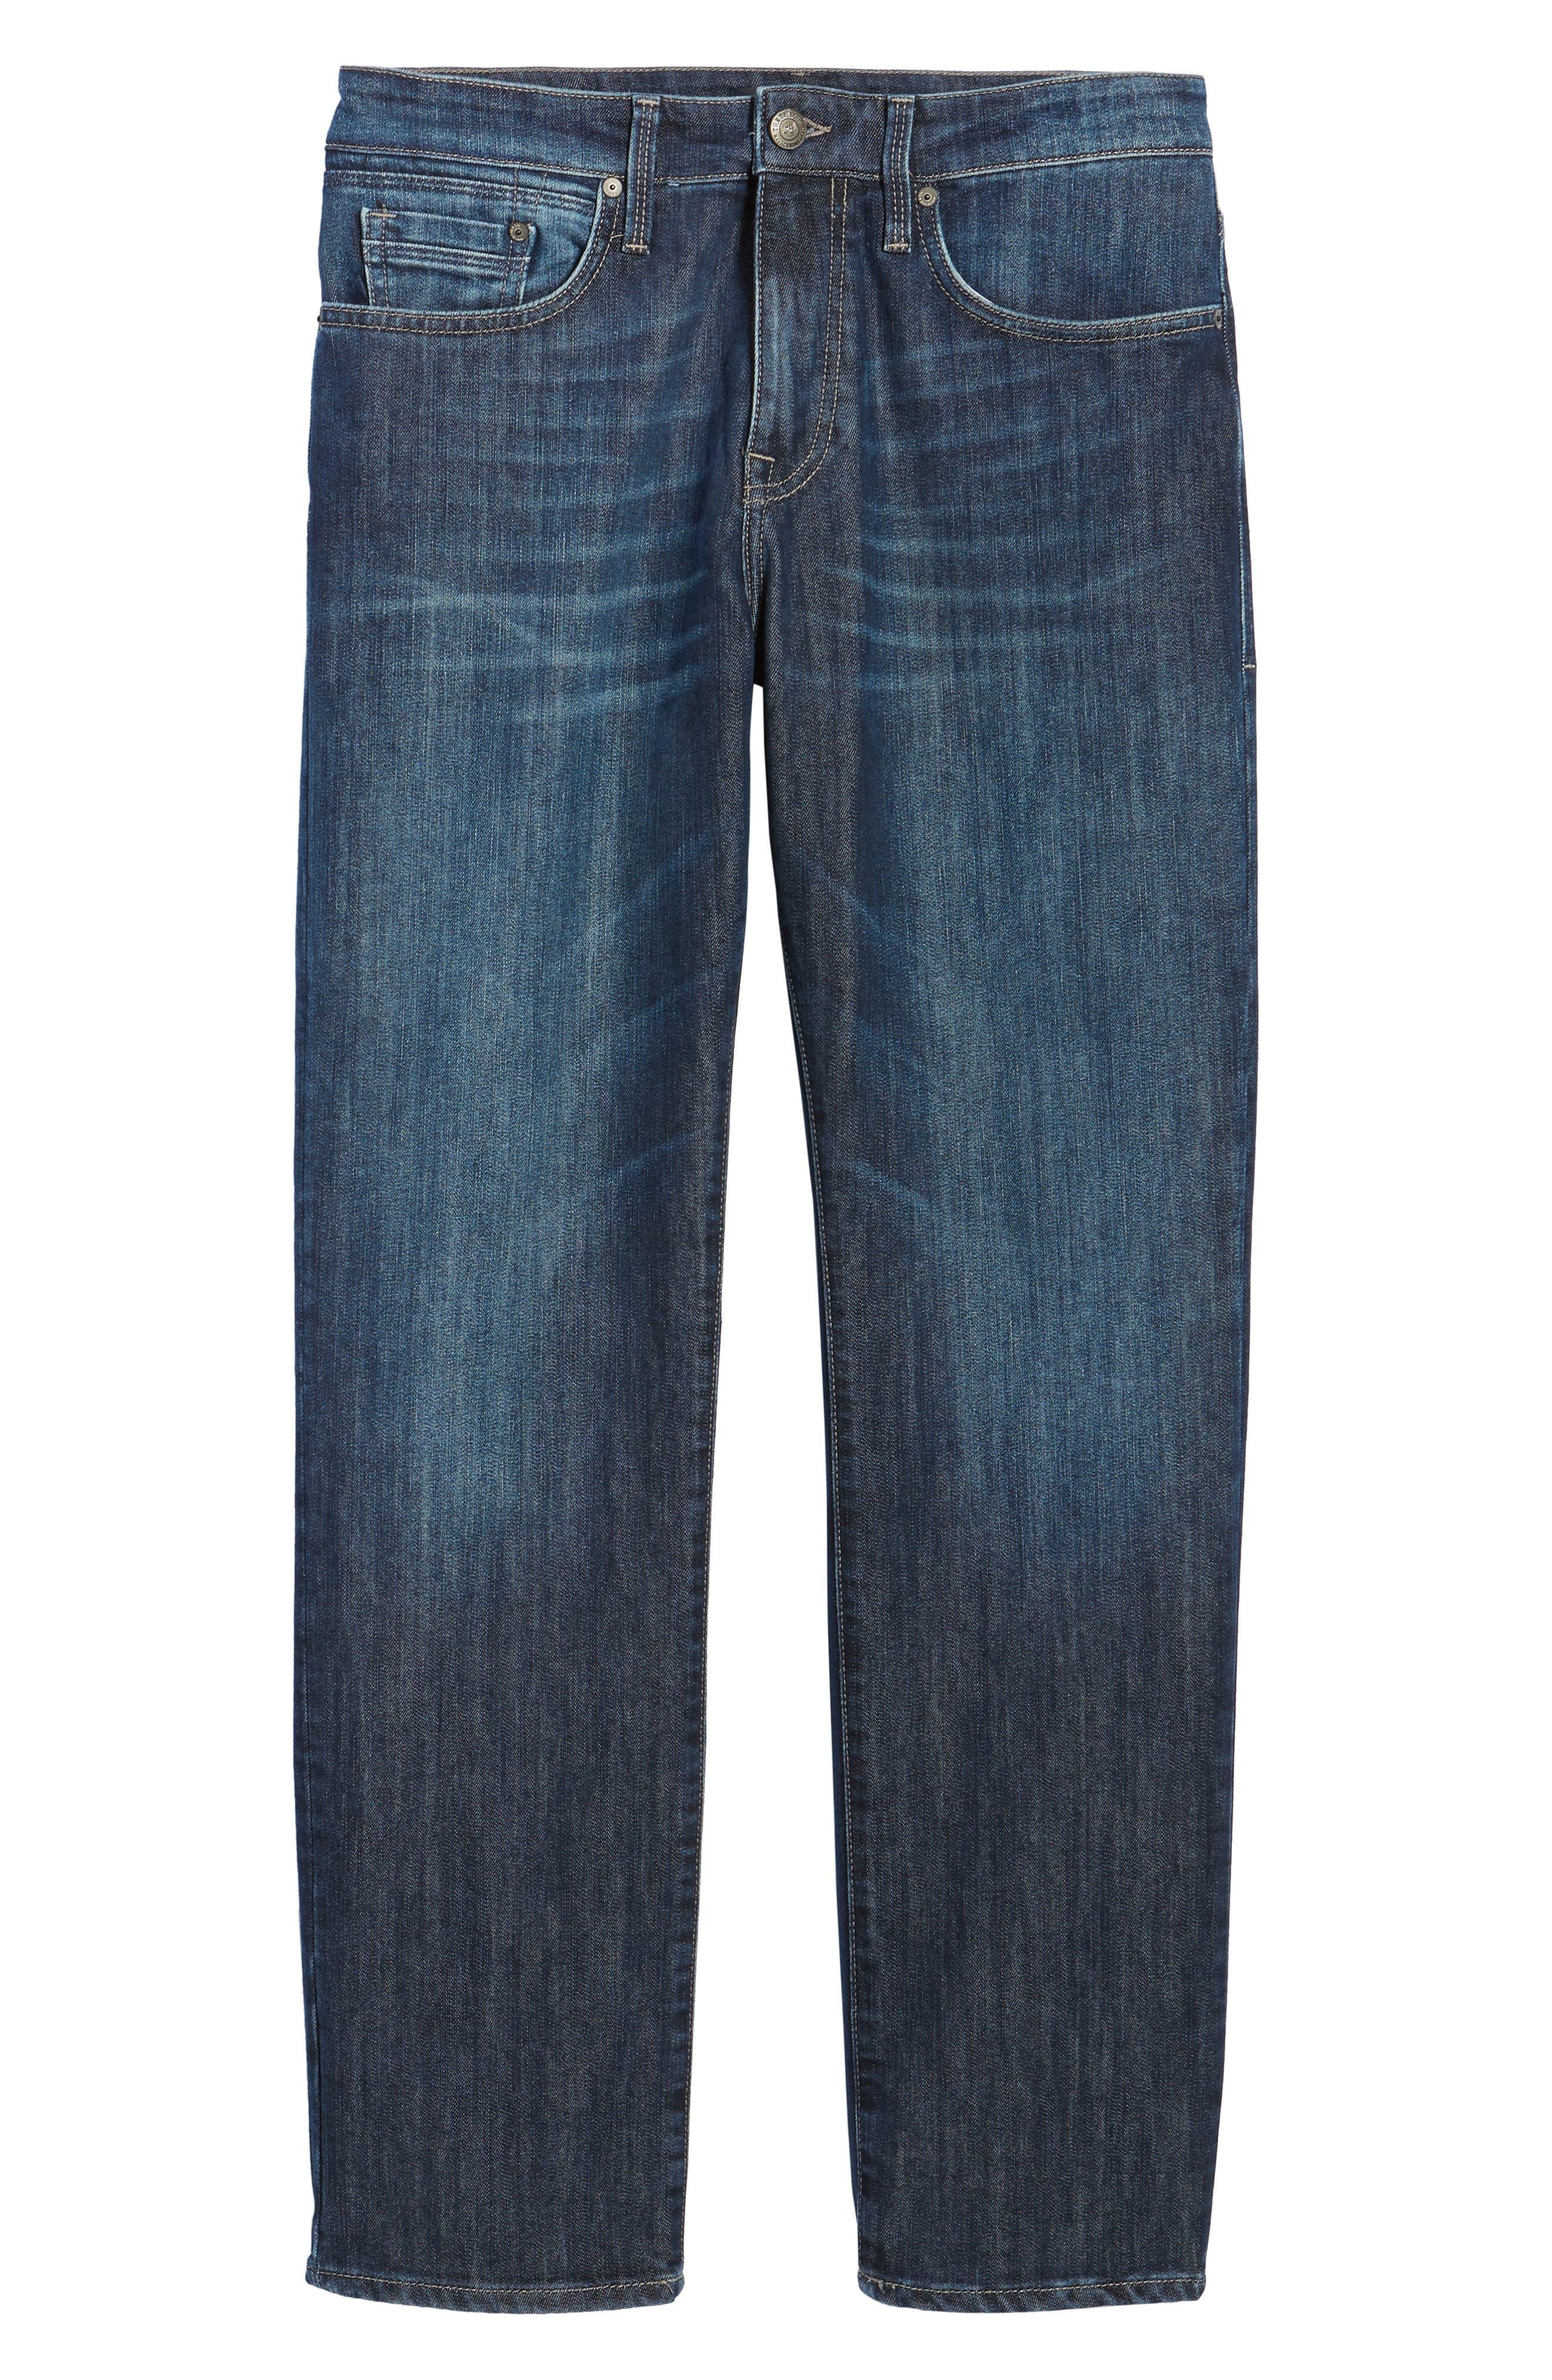 Myles Straight Leg Jeans,                             Alternate thumbnail 6, color,